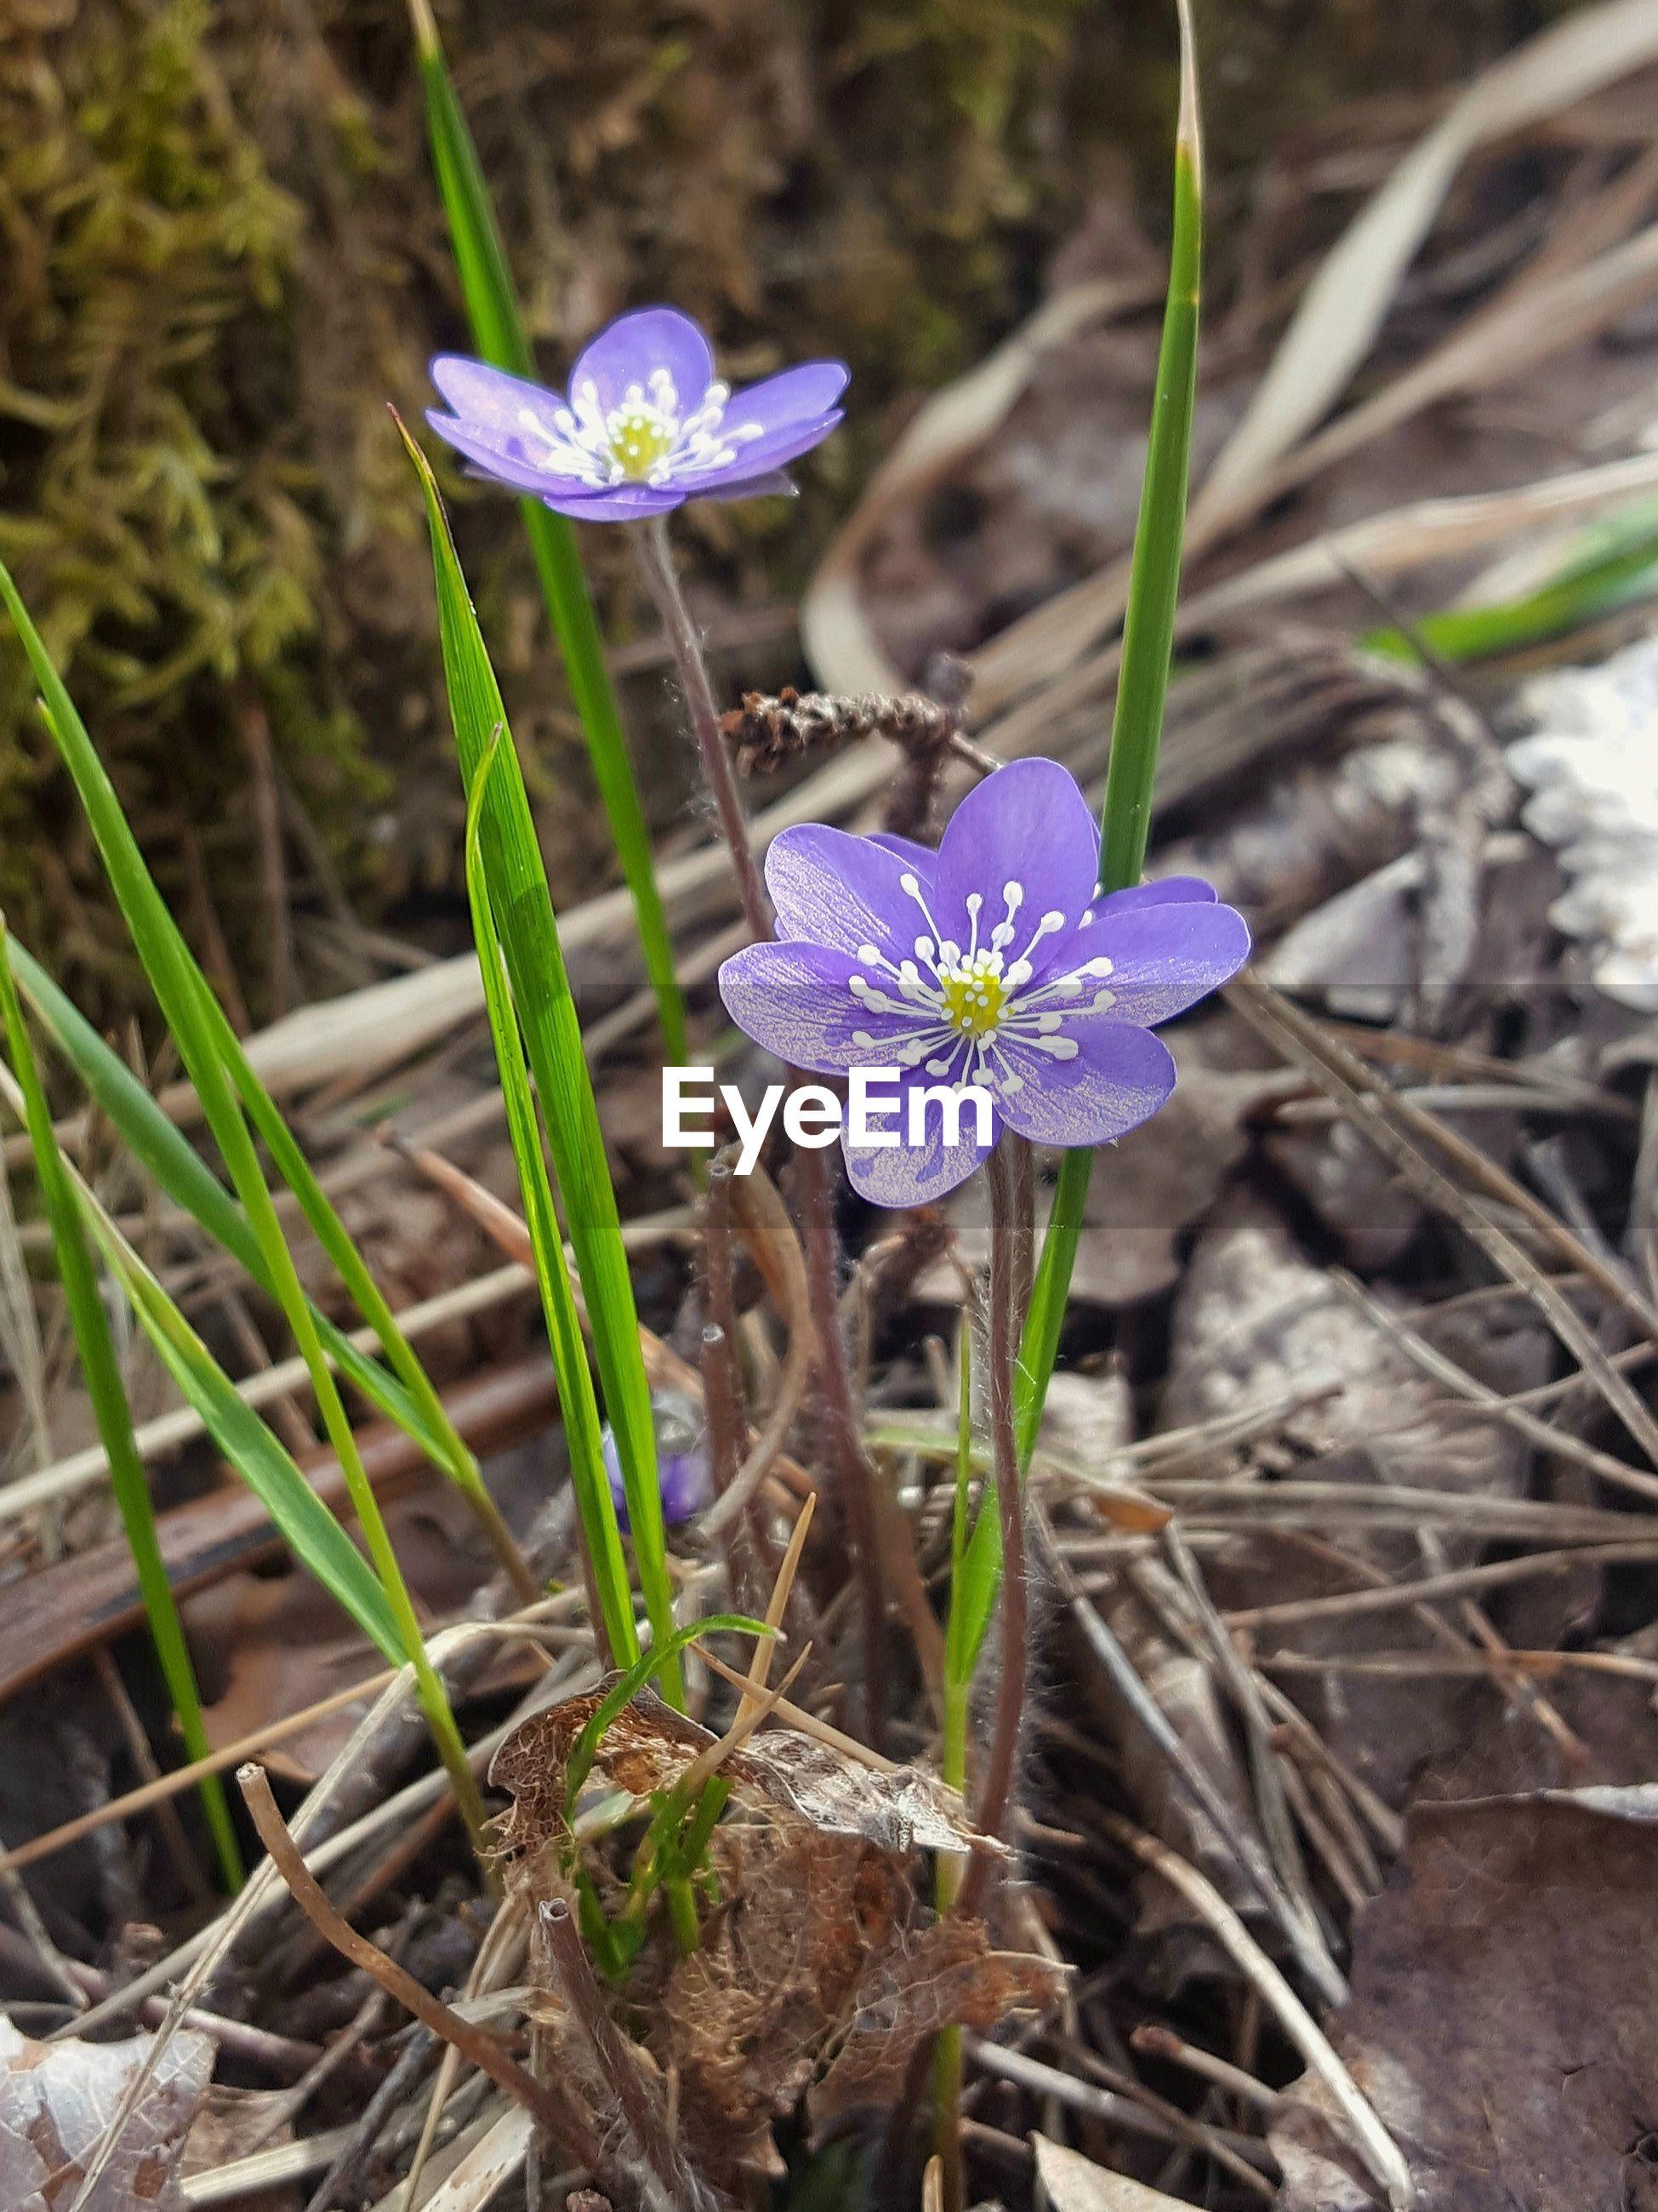 HIGH ANGLE VIEW OF PURPLE CROCUS FLOWER